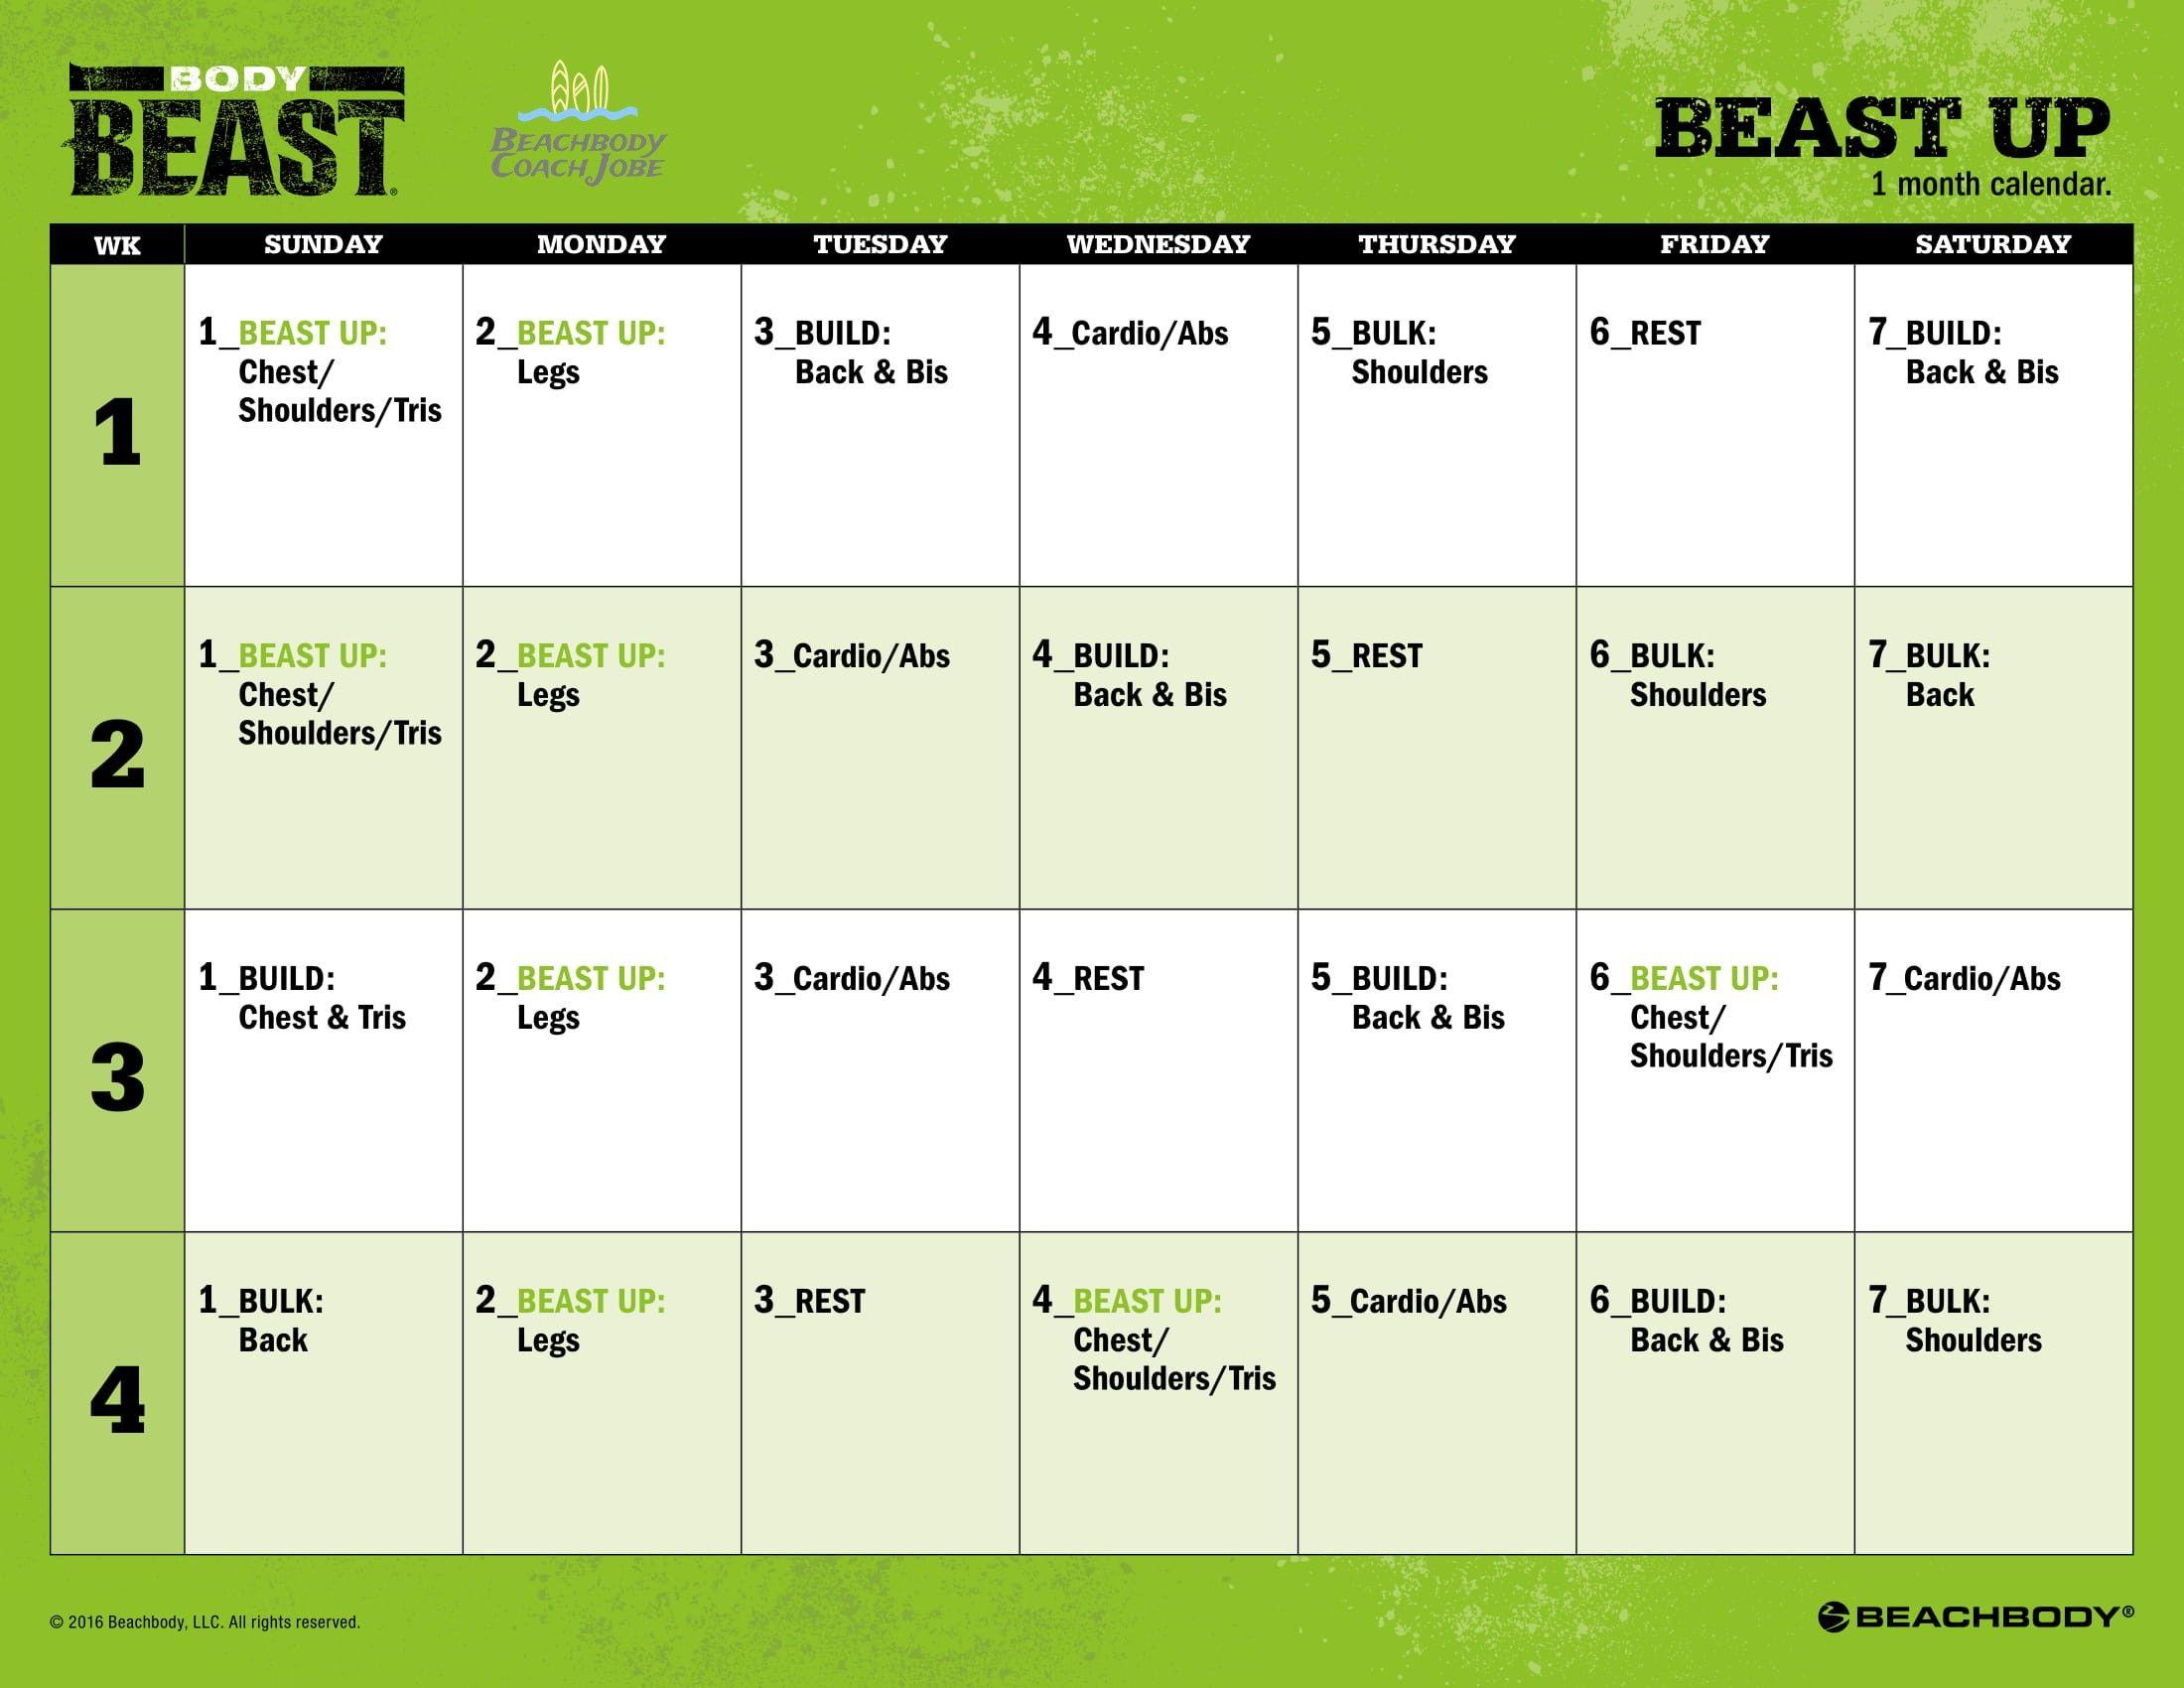 Body Beast Beast Up Calendar By Beachbody The Creators Of